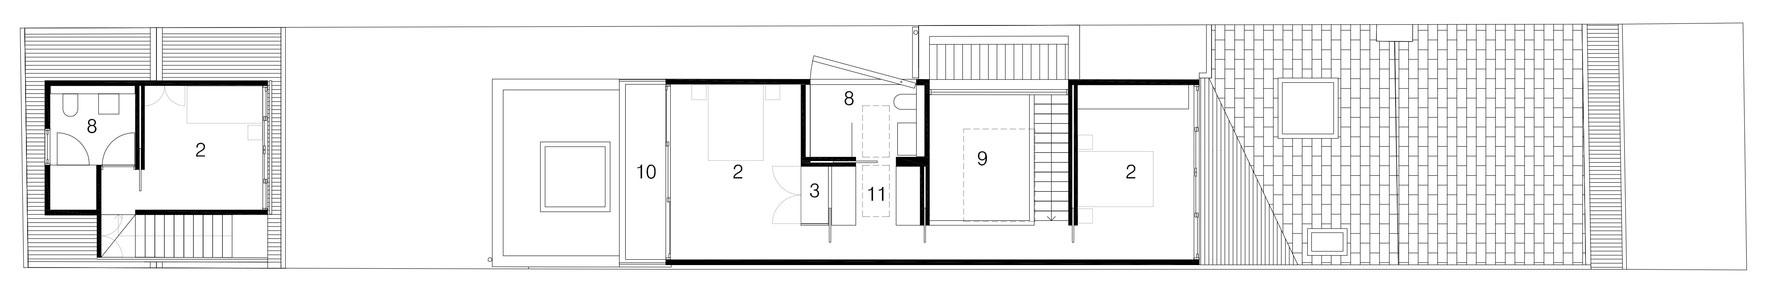 Bondi-House-12